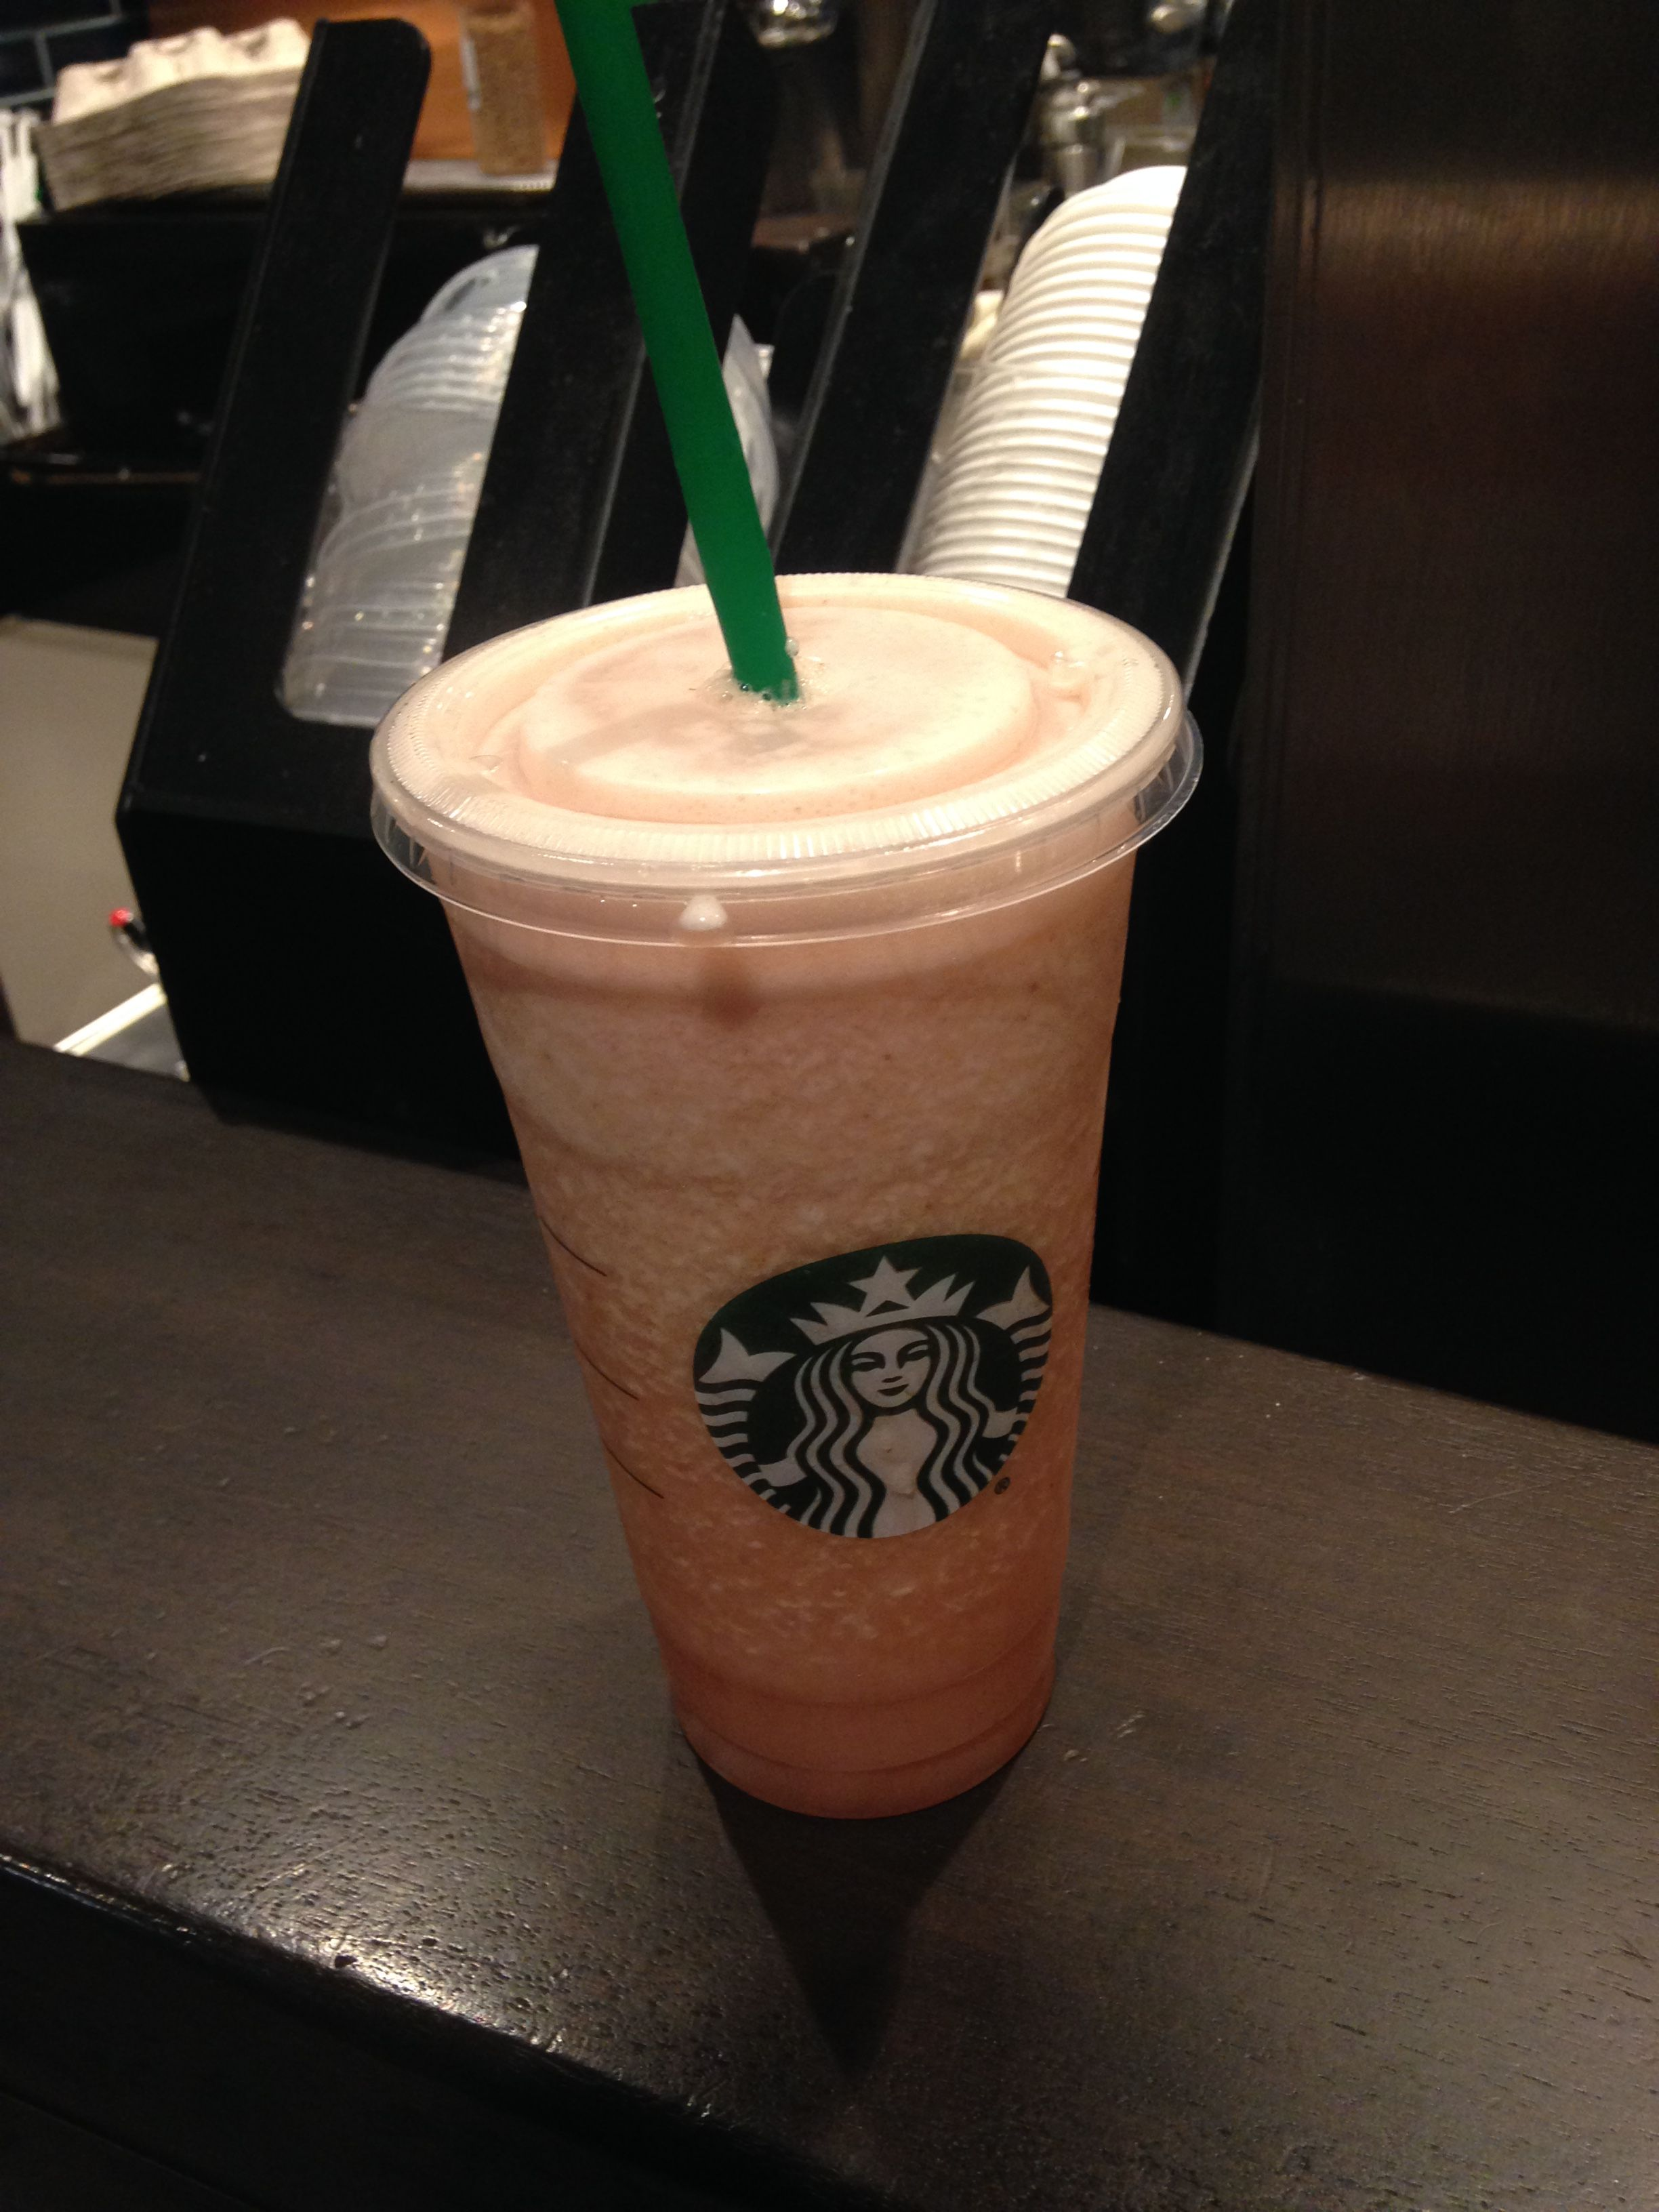 Pin by JE on Starbucks ️ Starbucks secret menu